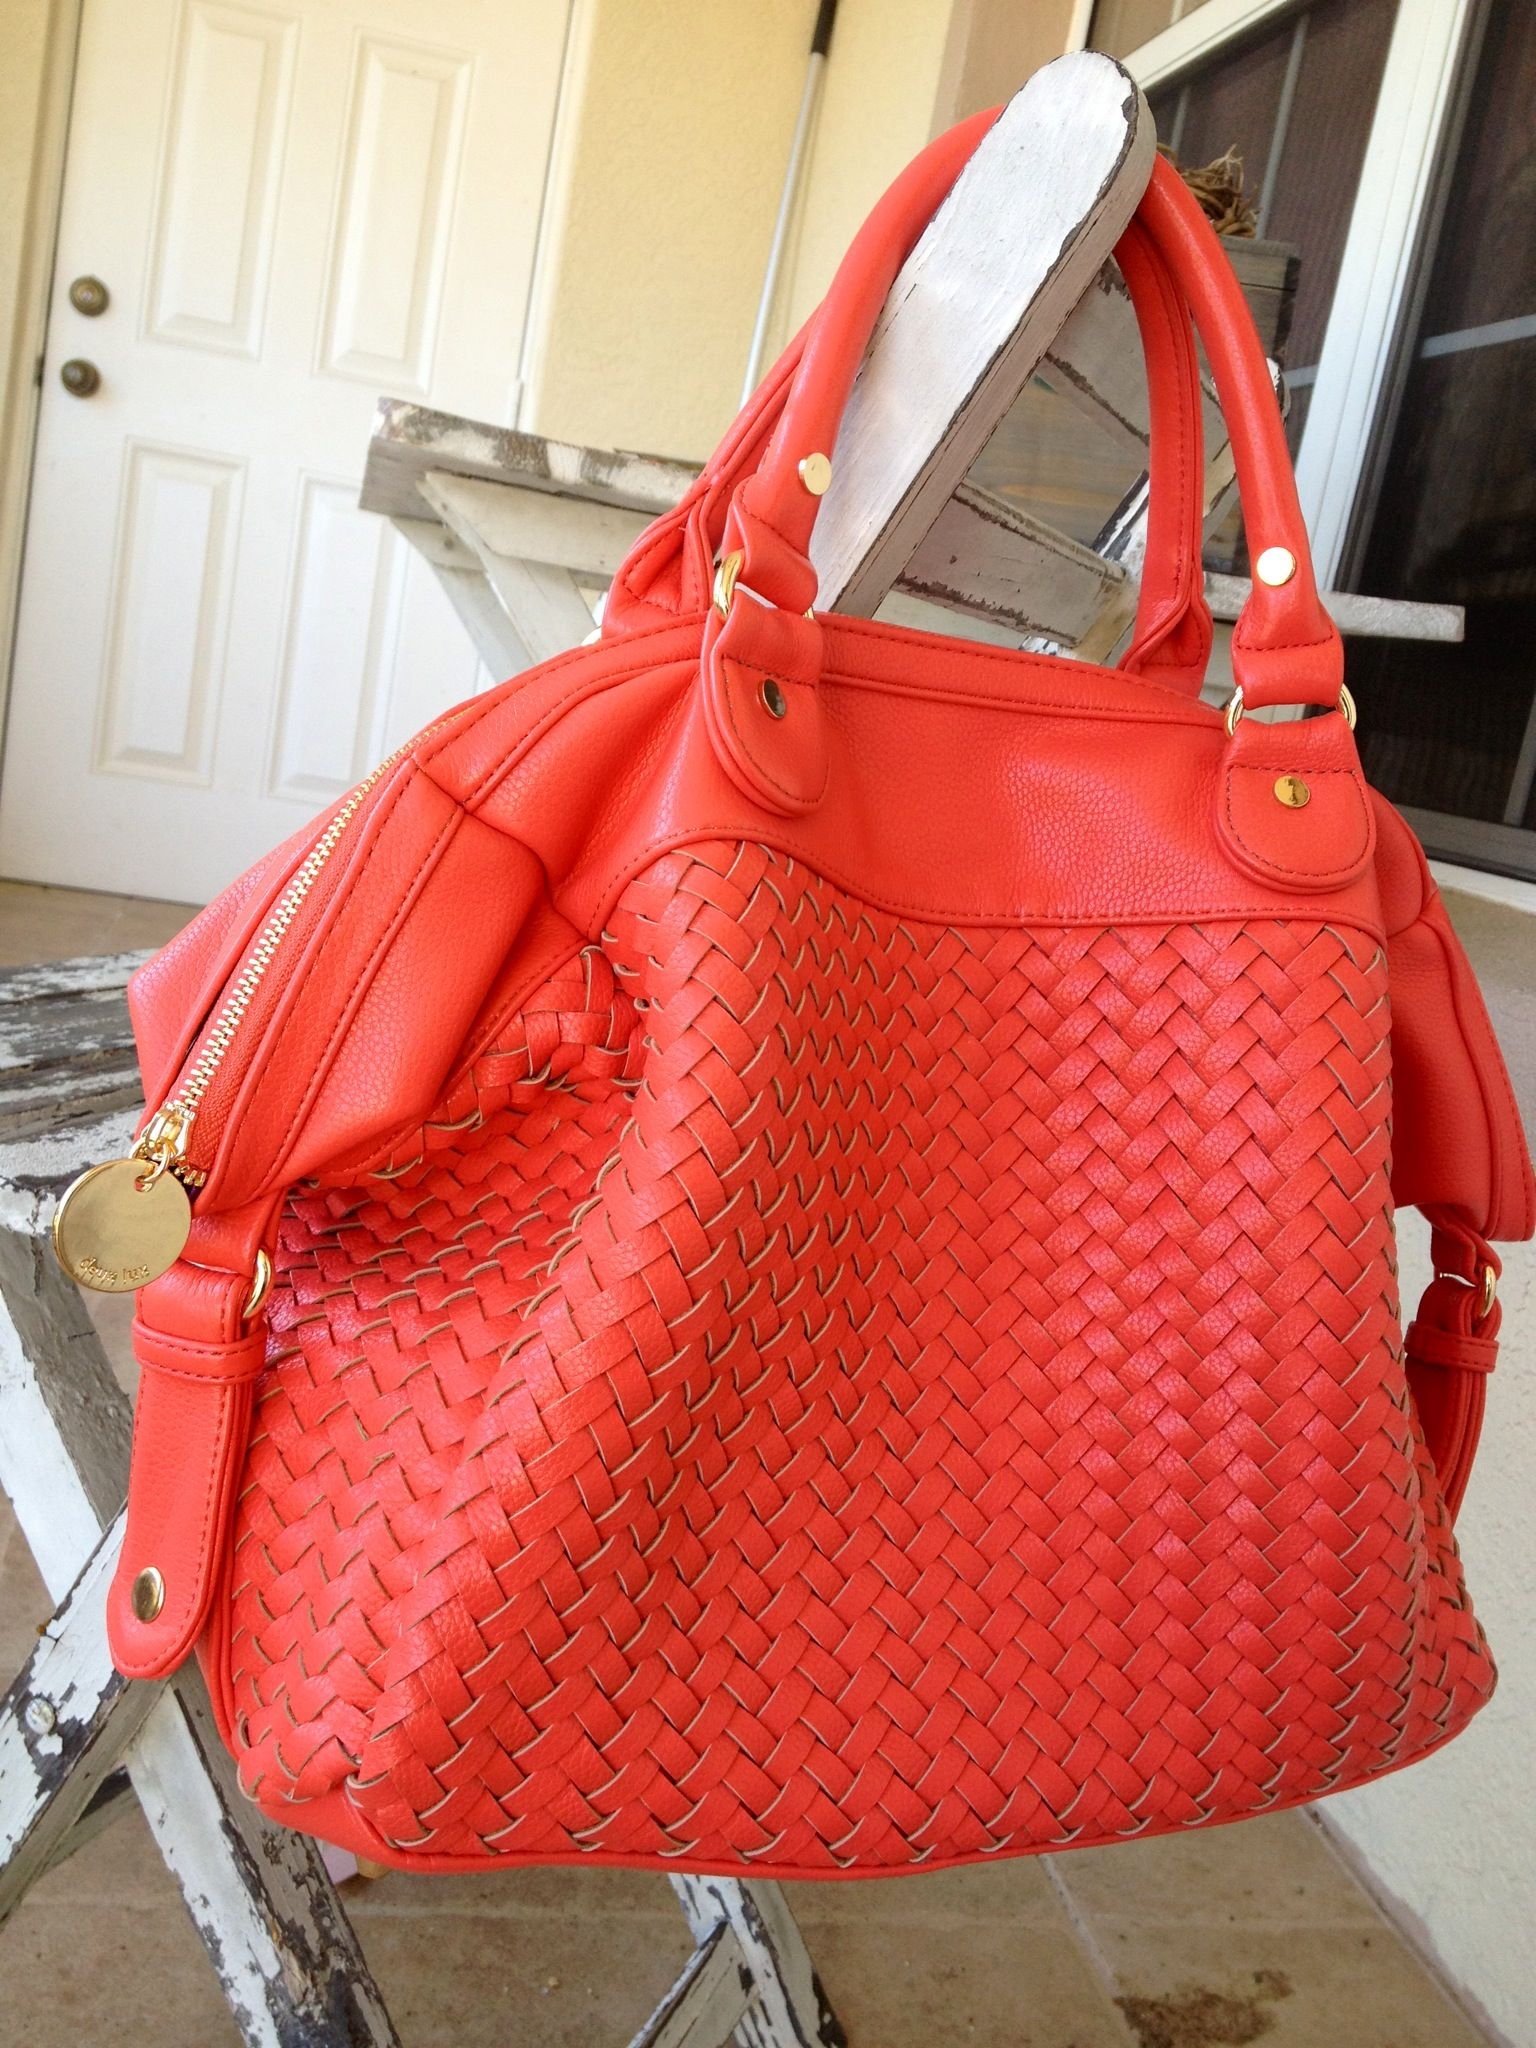 de028a79f403 deux lux bag in coral  anthropologie. deux lux bag in coral  anthropologie Best  Purses